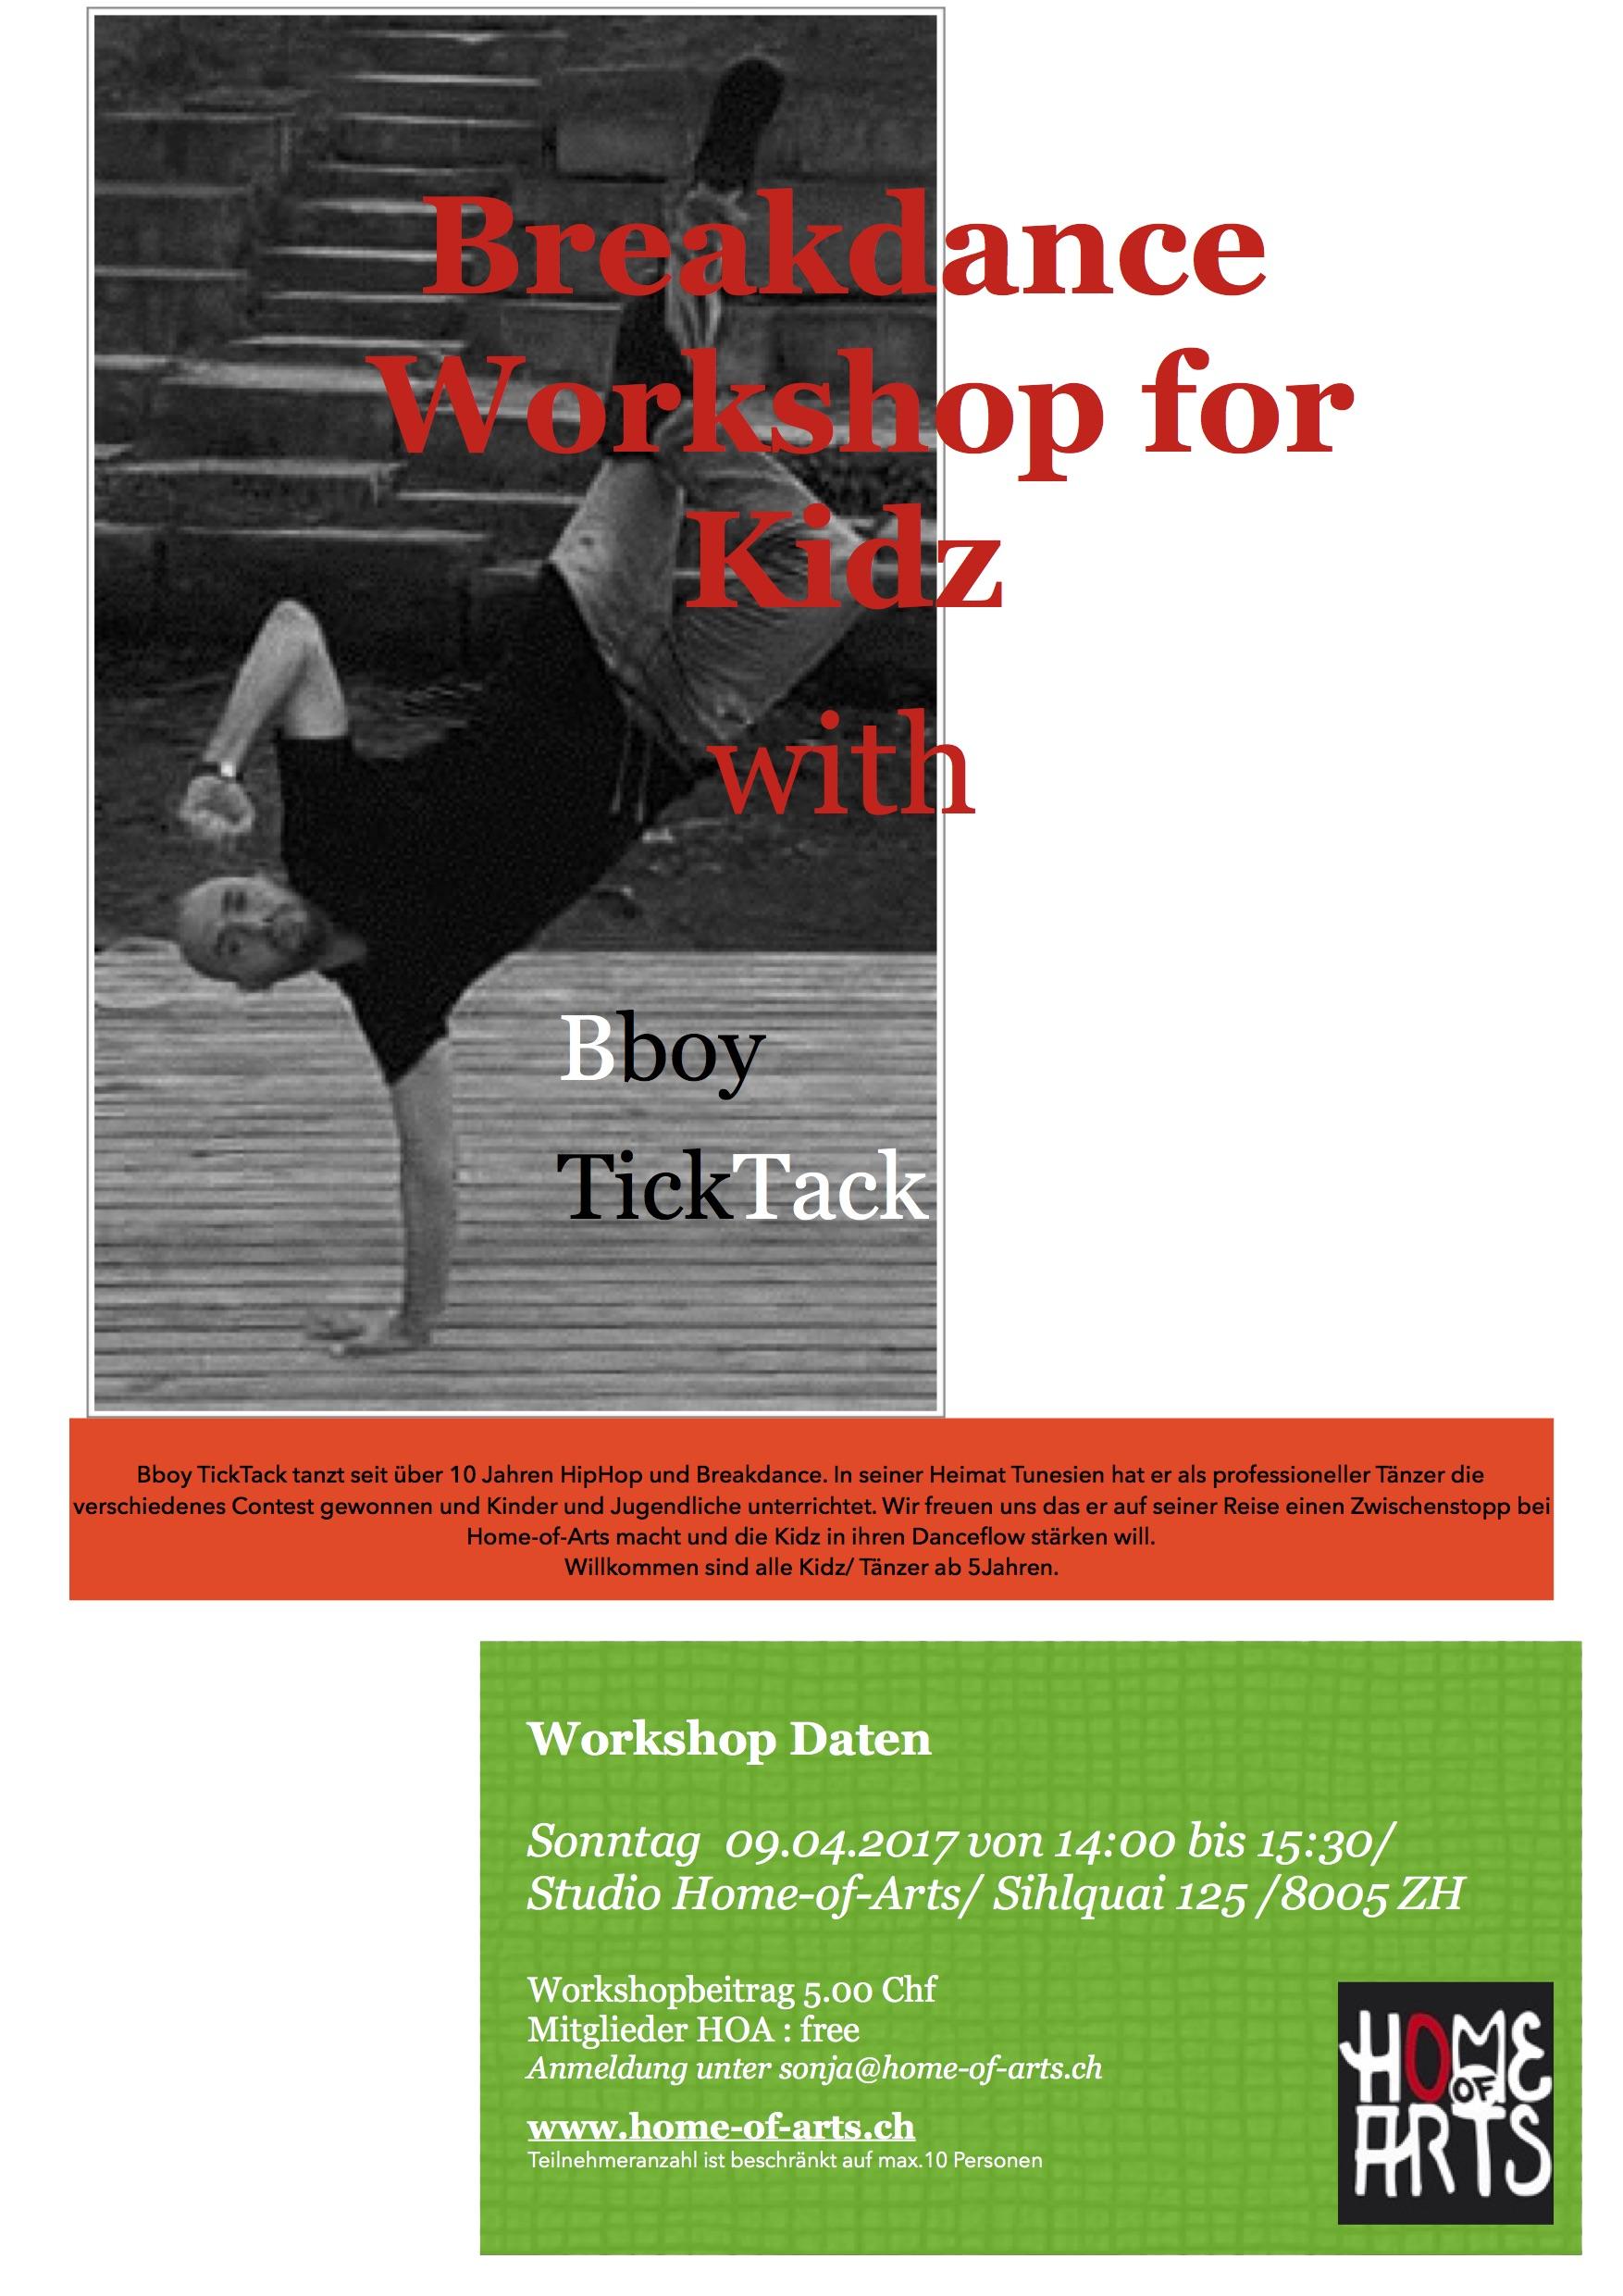 Workshop Bboy TickTack jpeg